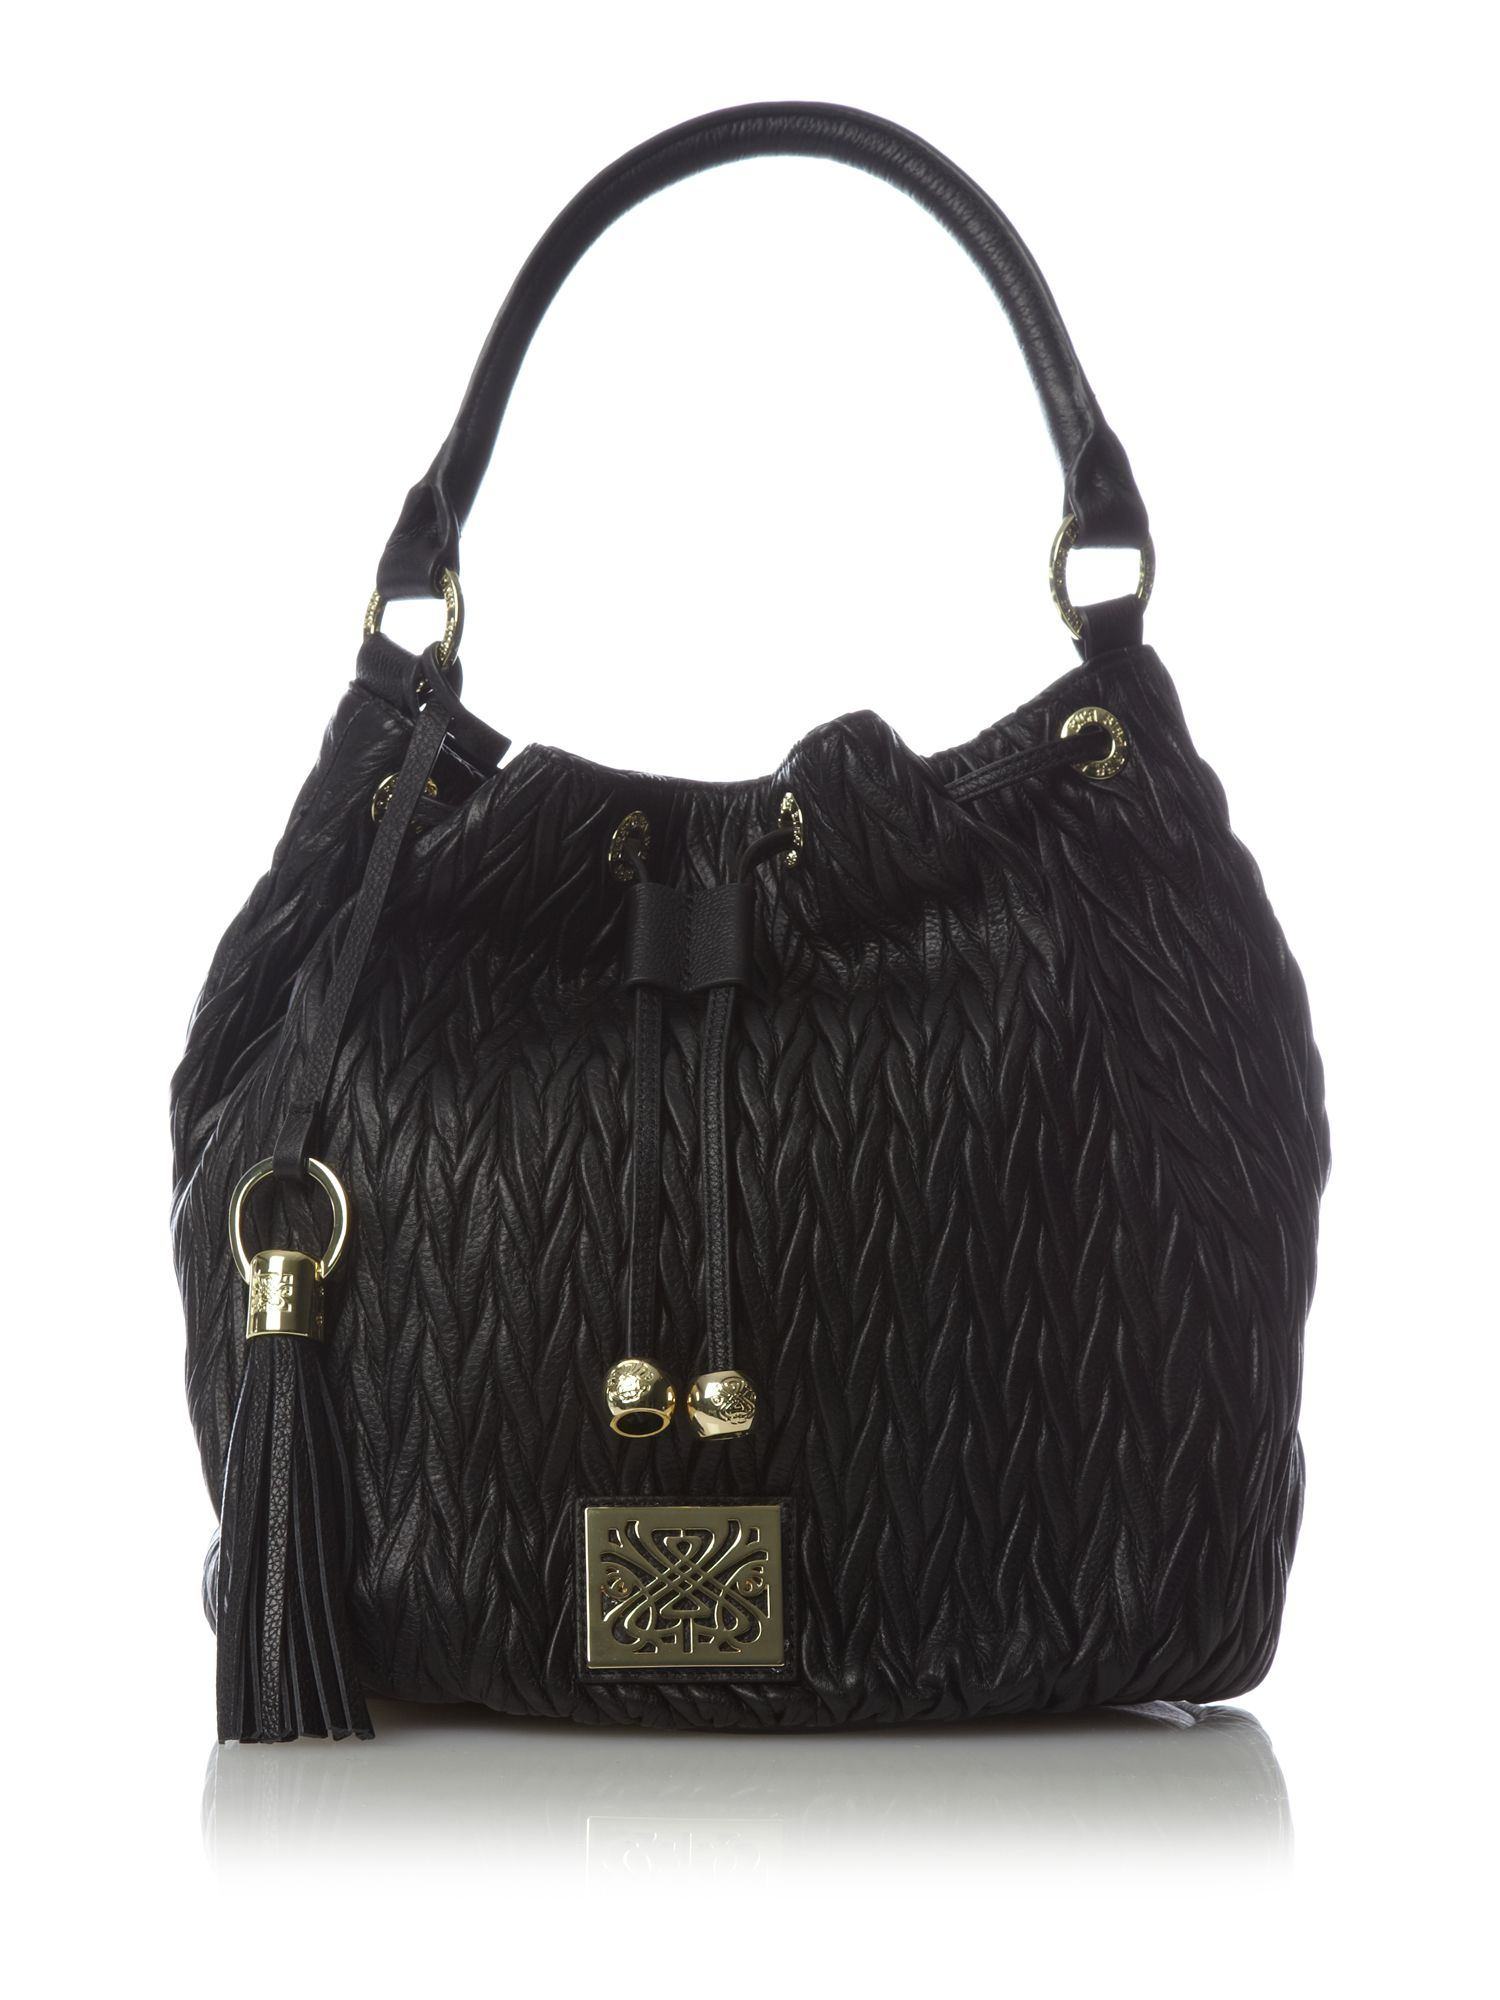 Biba Duffle Bag in Black